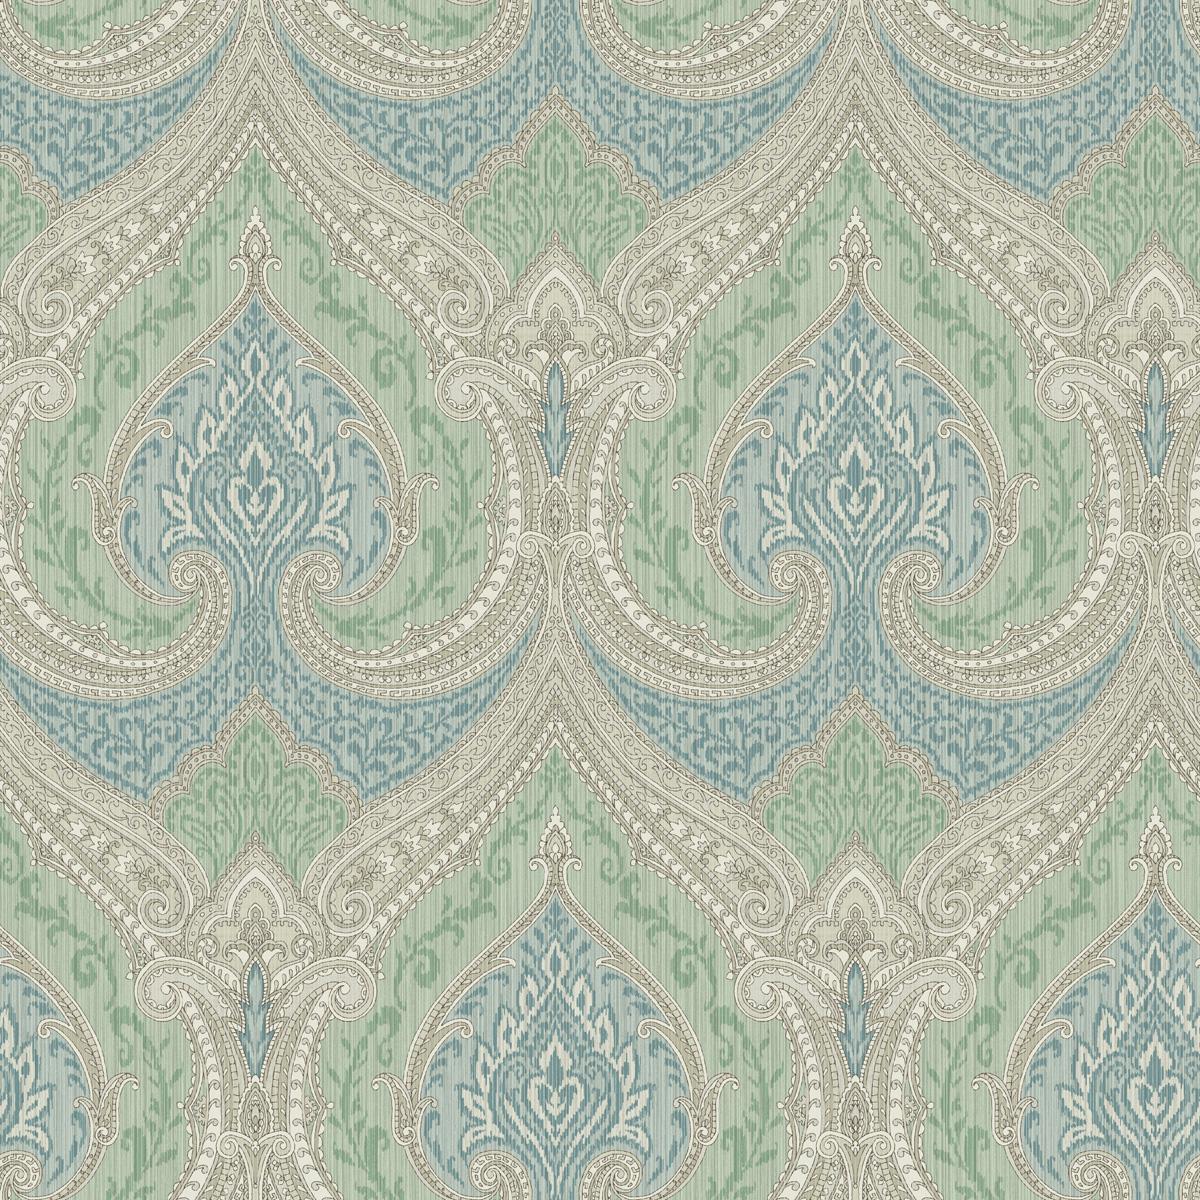 wallquest eco chic wallpaper wallpapersafari